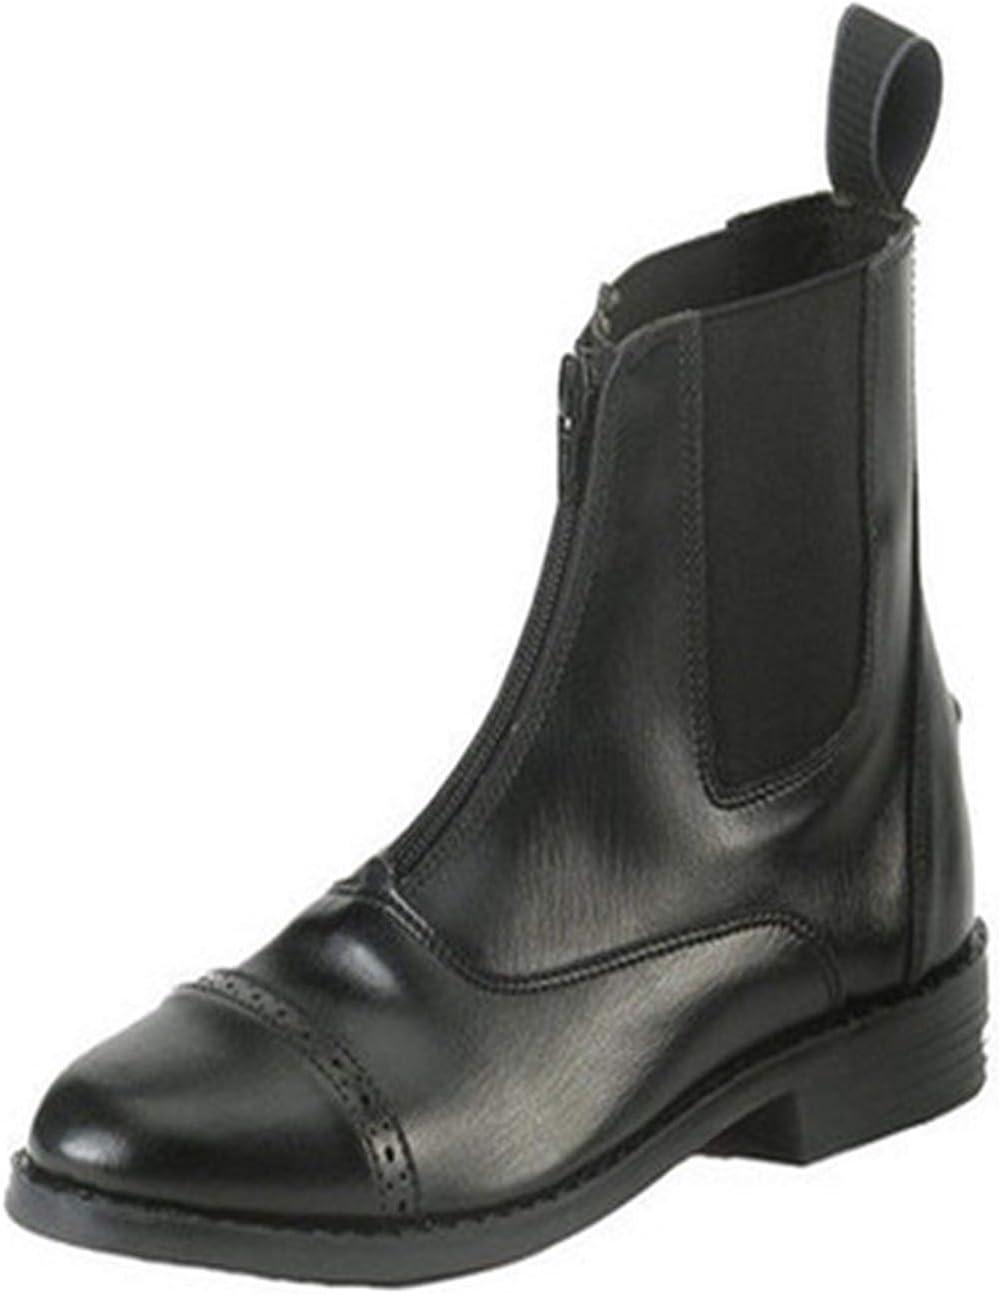 Equistar - Child's Zip Paddock Boot (All Weather) 3 Black